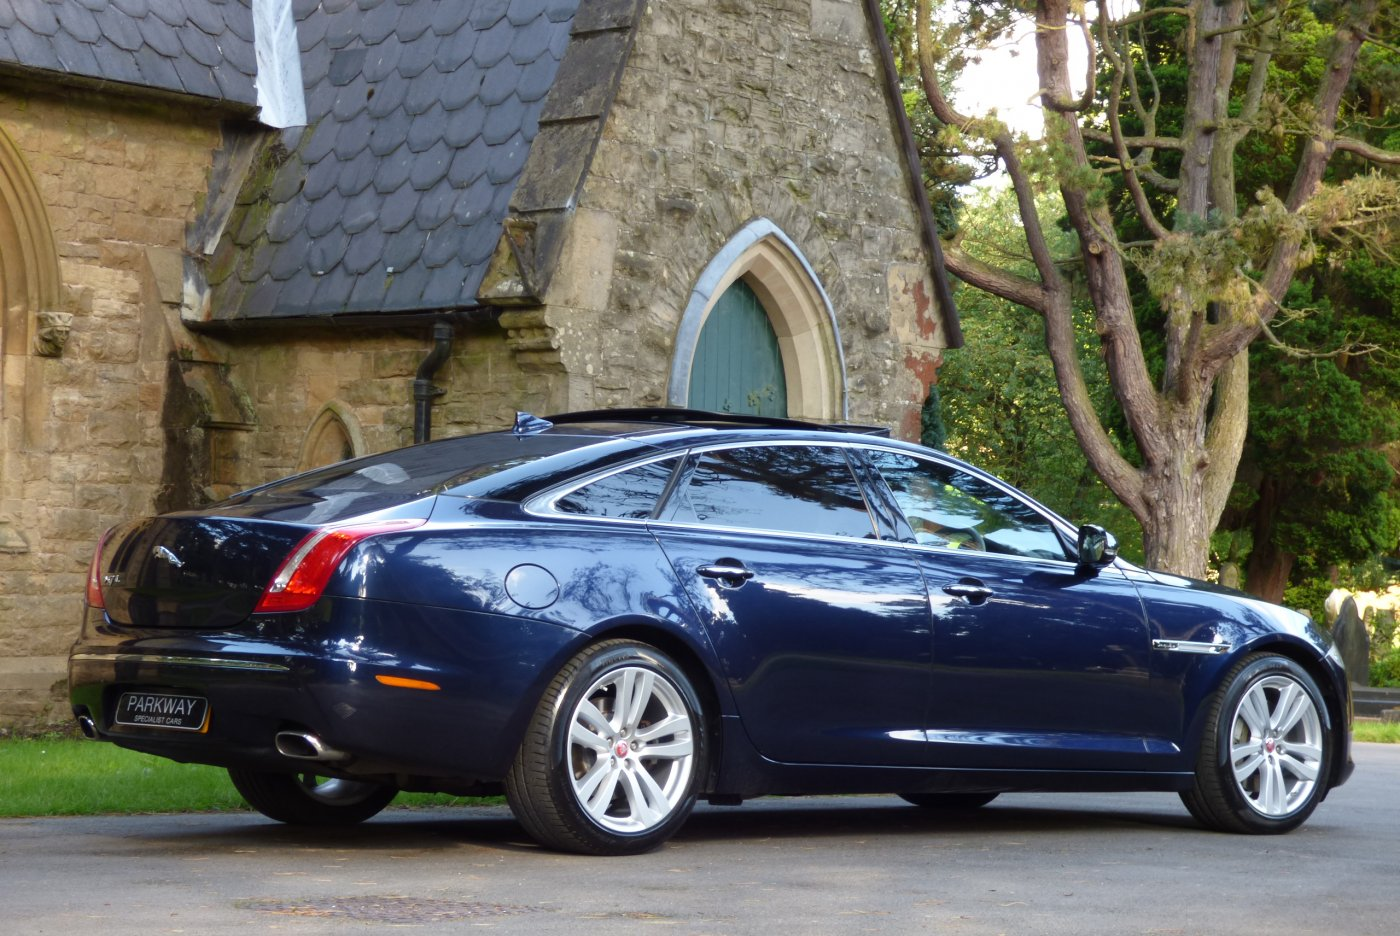 grey premium xj details saloon d md used thumbnail automatic door car luxury jaguar london image diesel